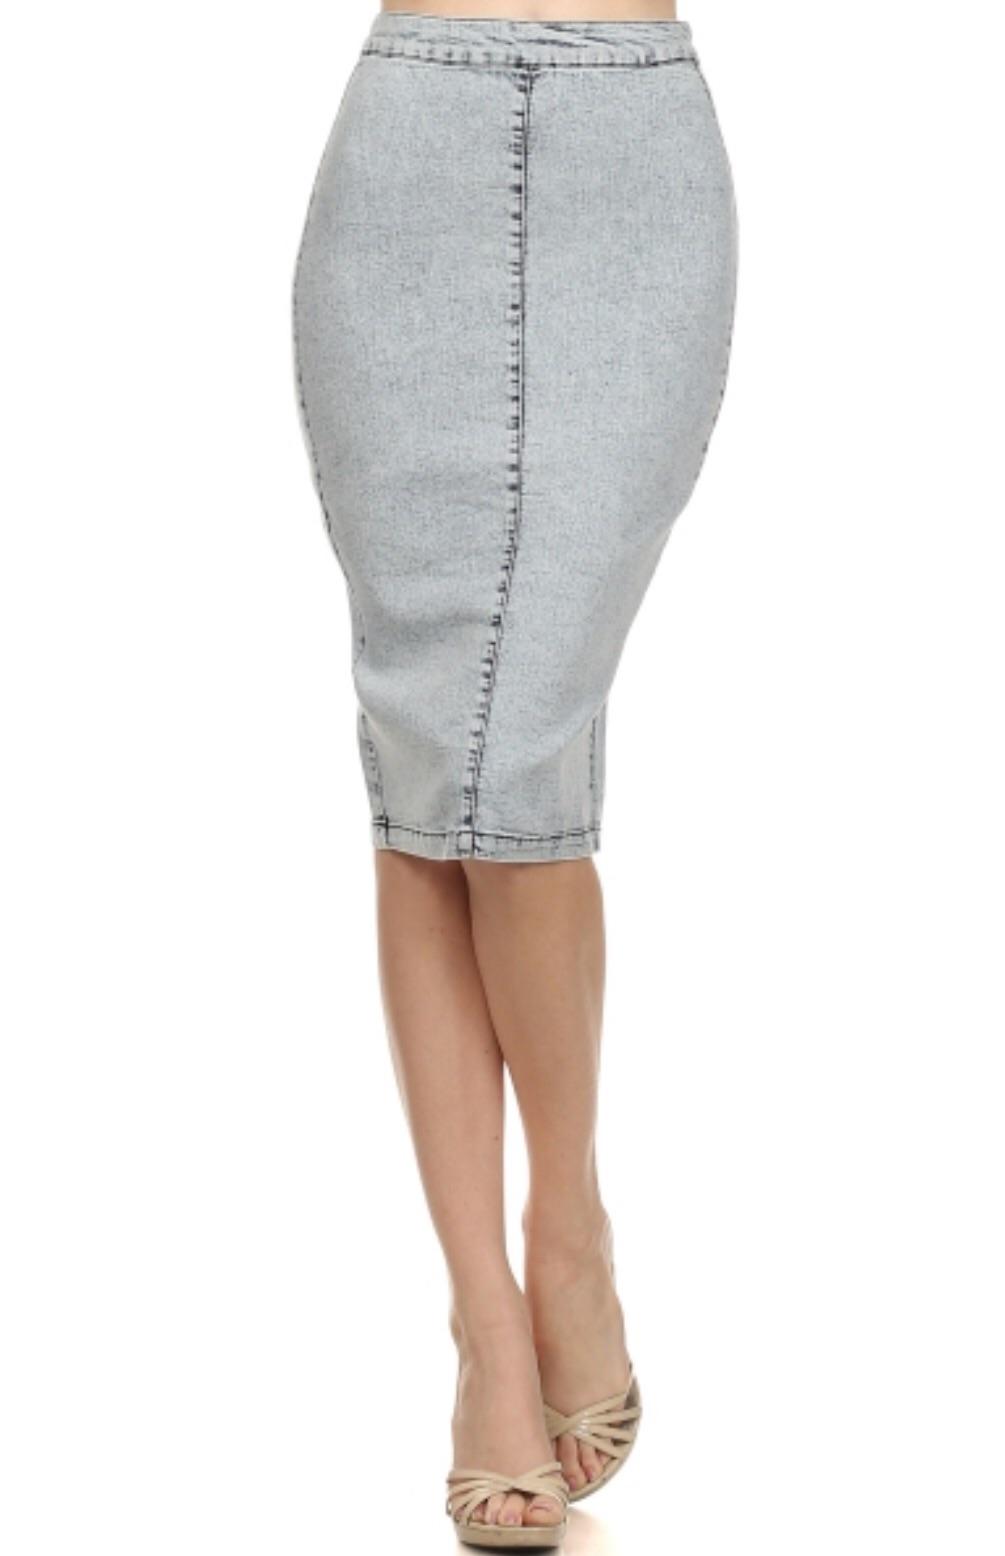 midi denim pencil skirt 183 trendy wendy z boutique 183